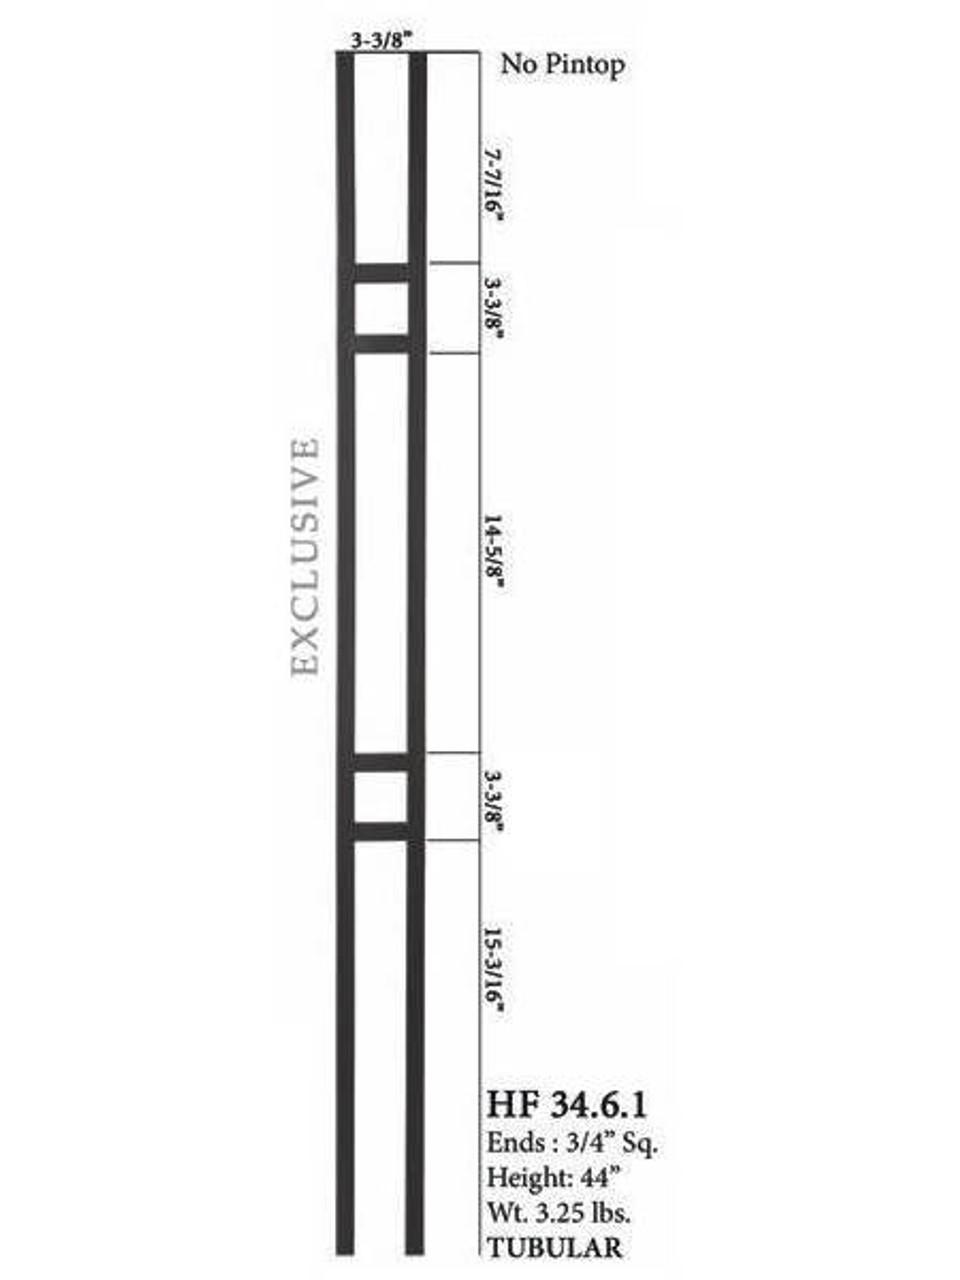 HF34.6.1 MEGA Double Square Aalto Steel Baluster 2